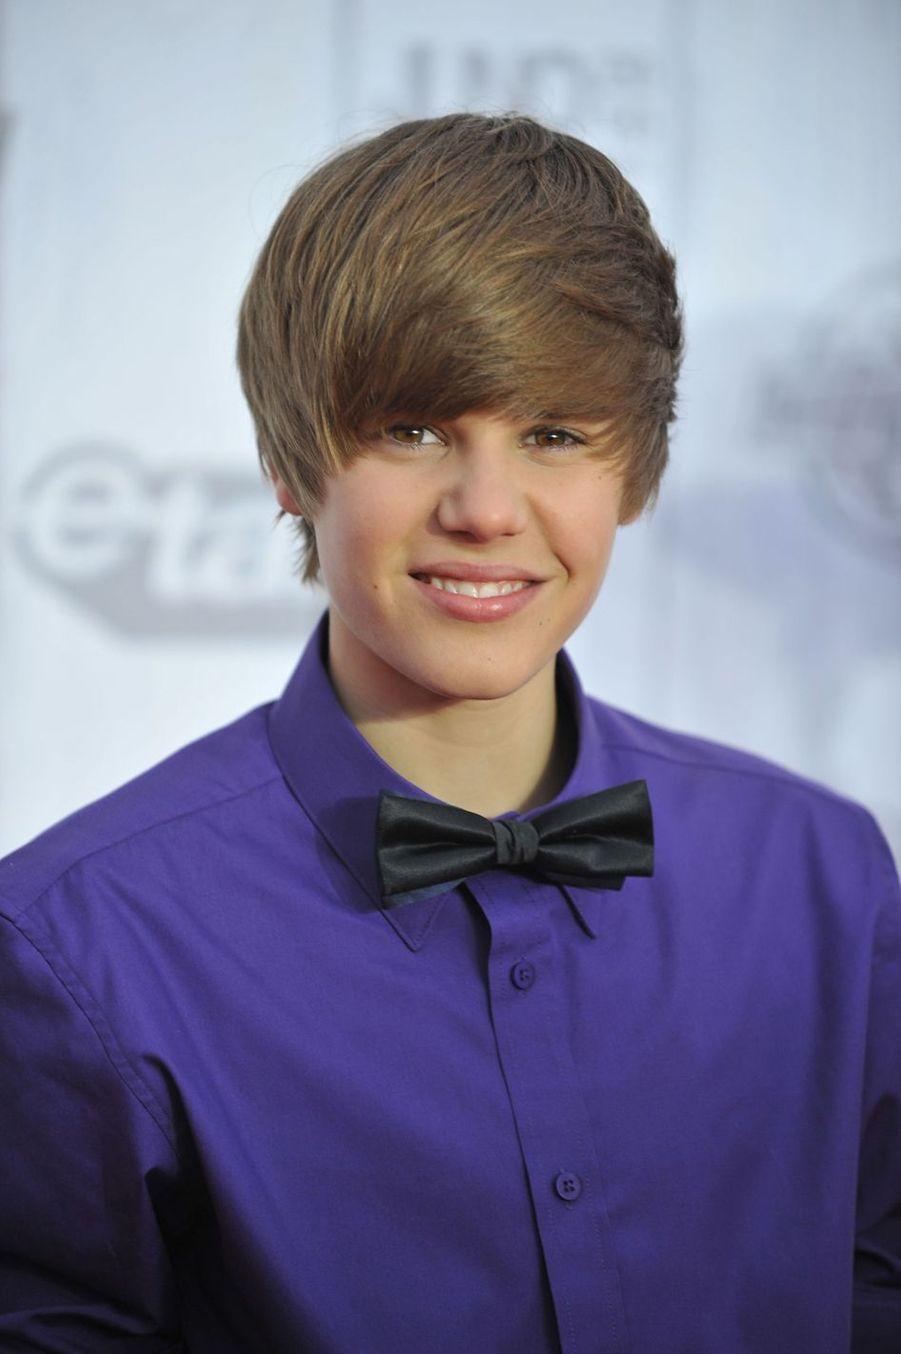 Justin Bieber aux Juno Awards en avril 2010 à Saint-Jean au Canada